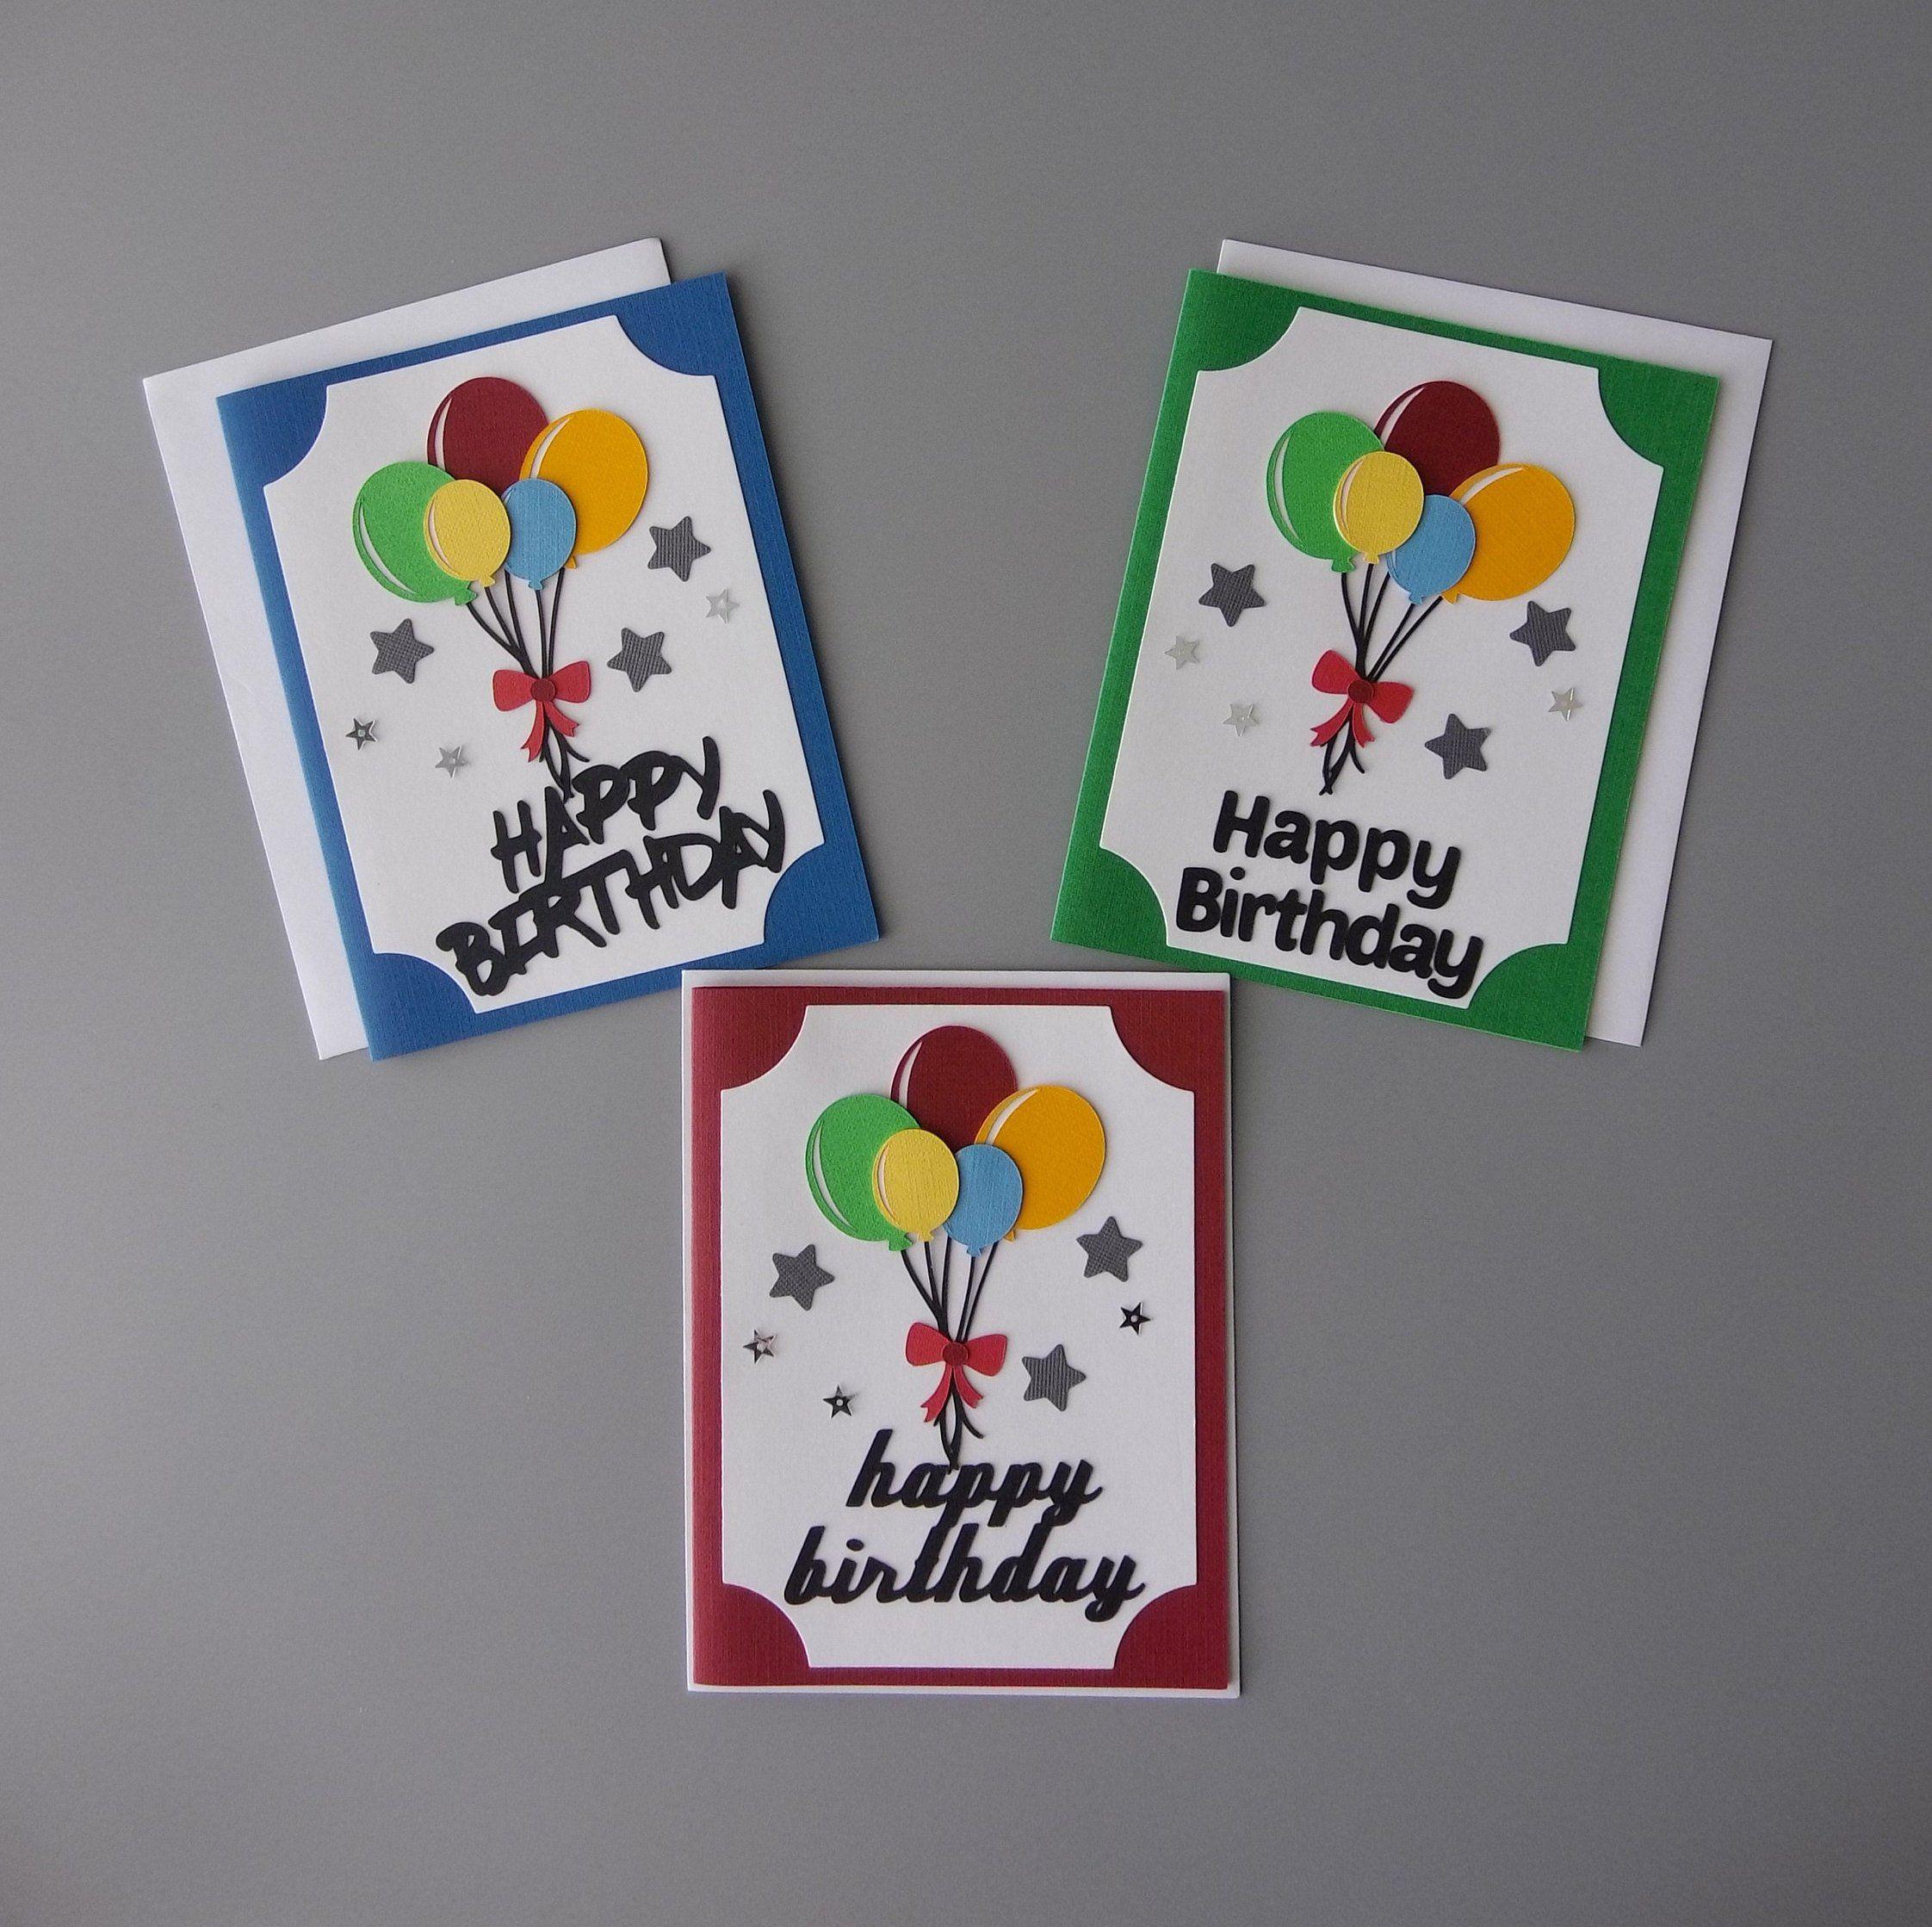 Birthday Card with Balloons Set, Friend Birthday Card